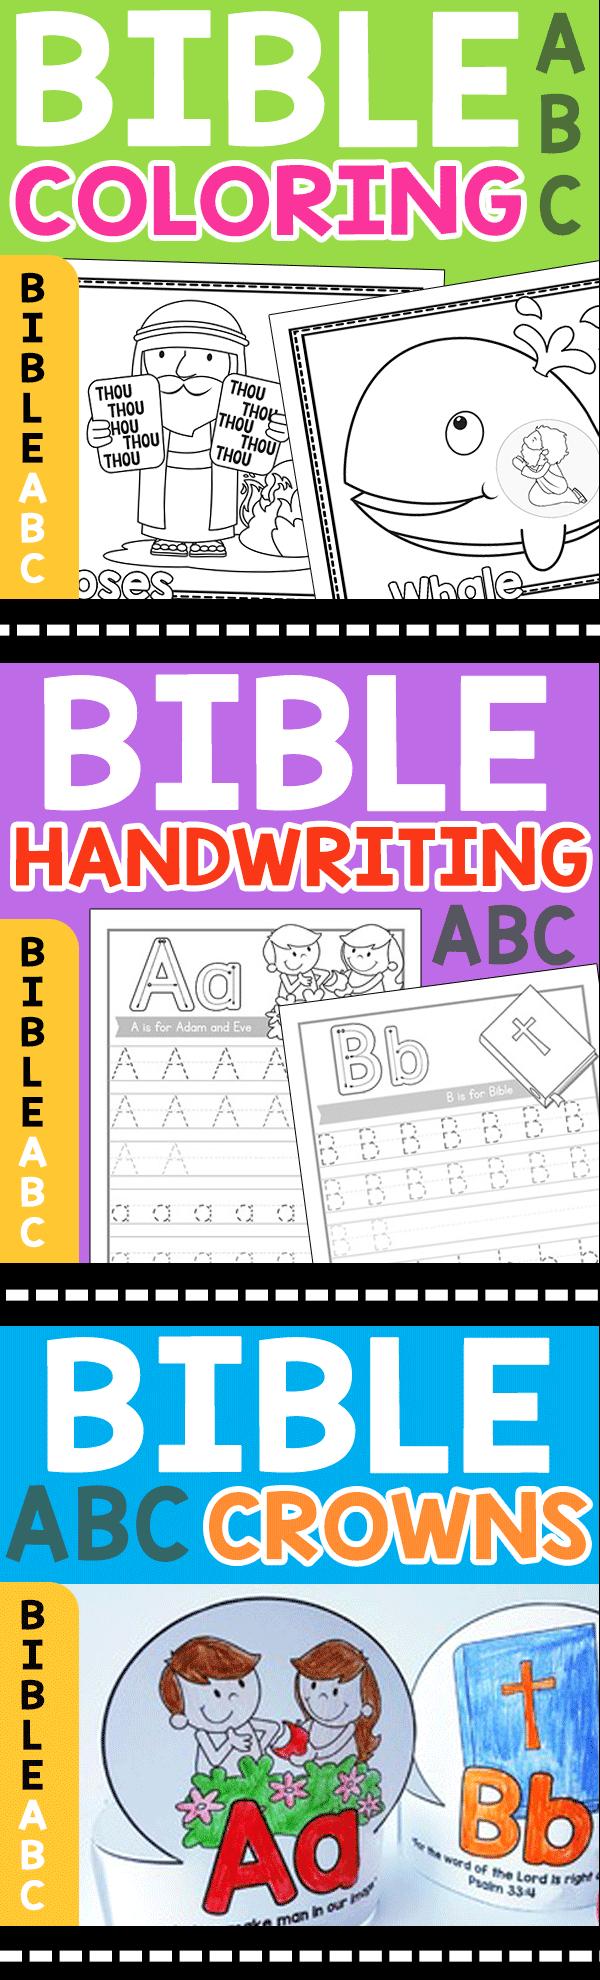 Bible Worksheets - Bible Story Printables - Free Printable Bible Games For Kids